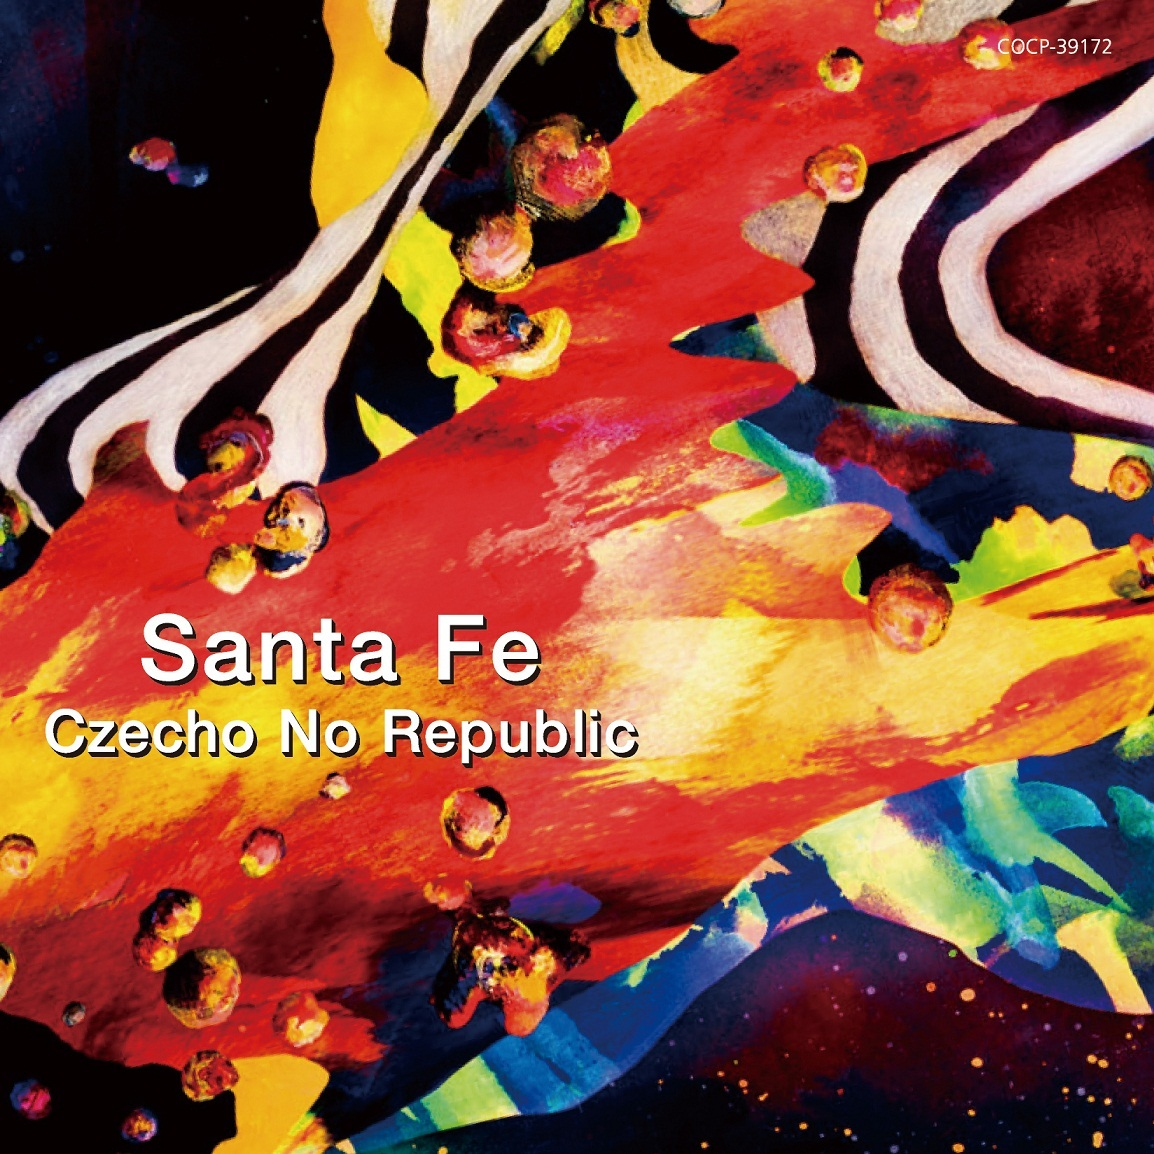 Santa Fe(通常版)